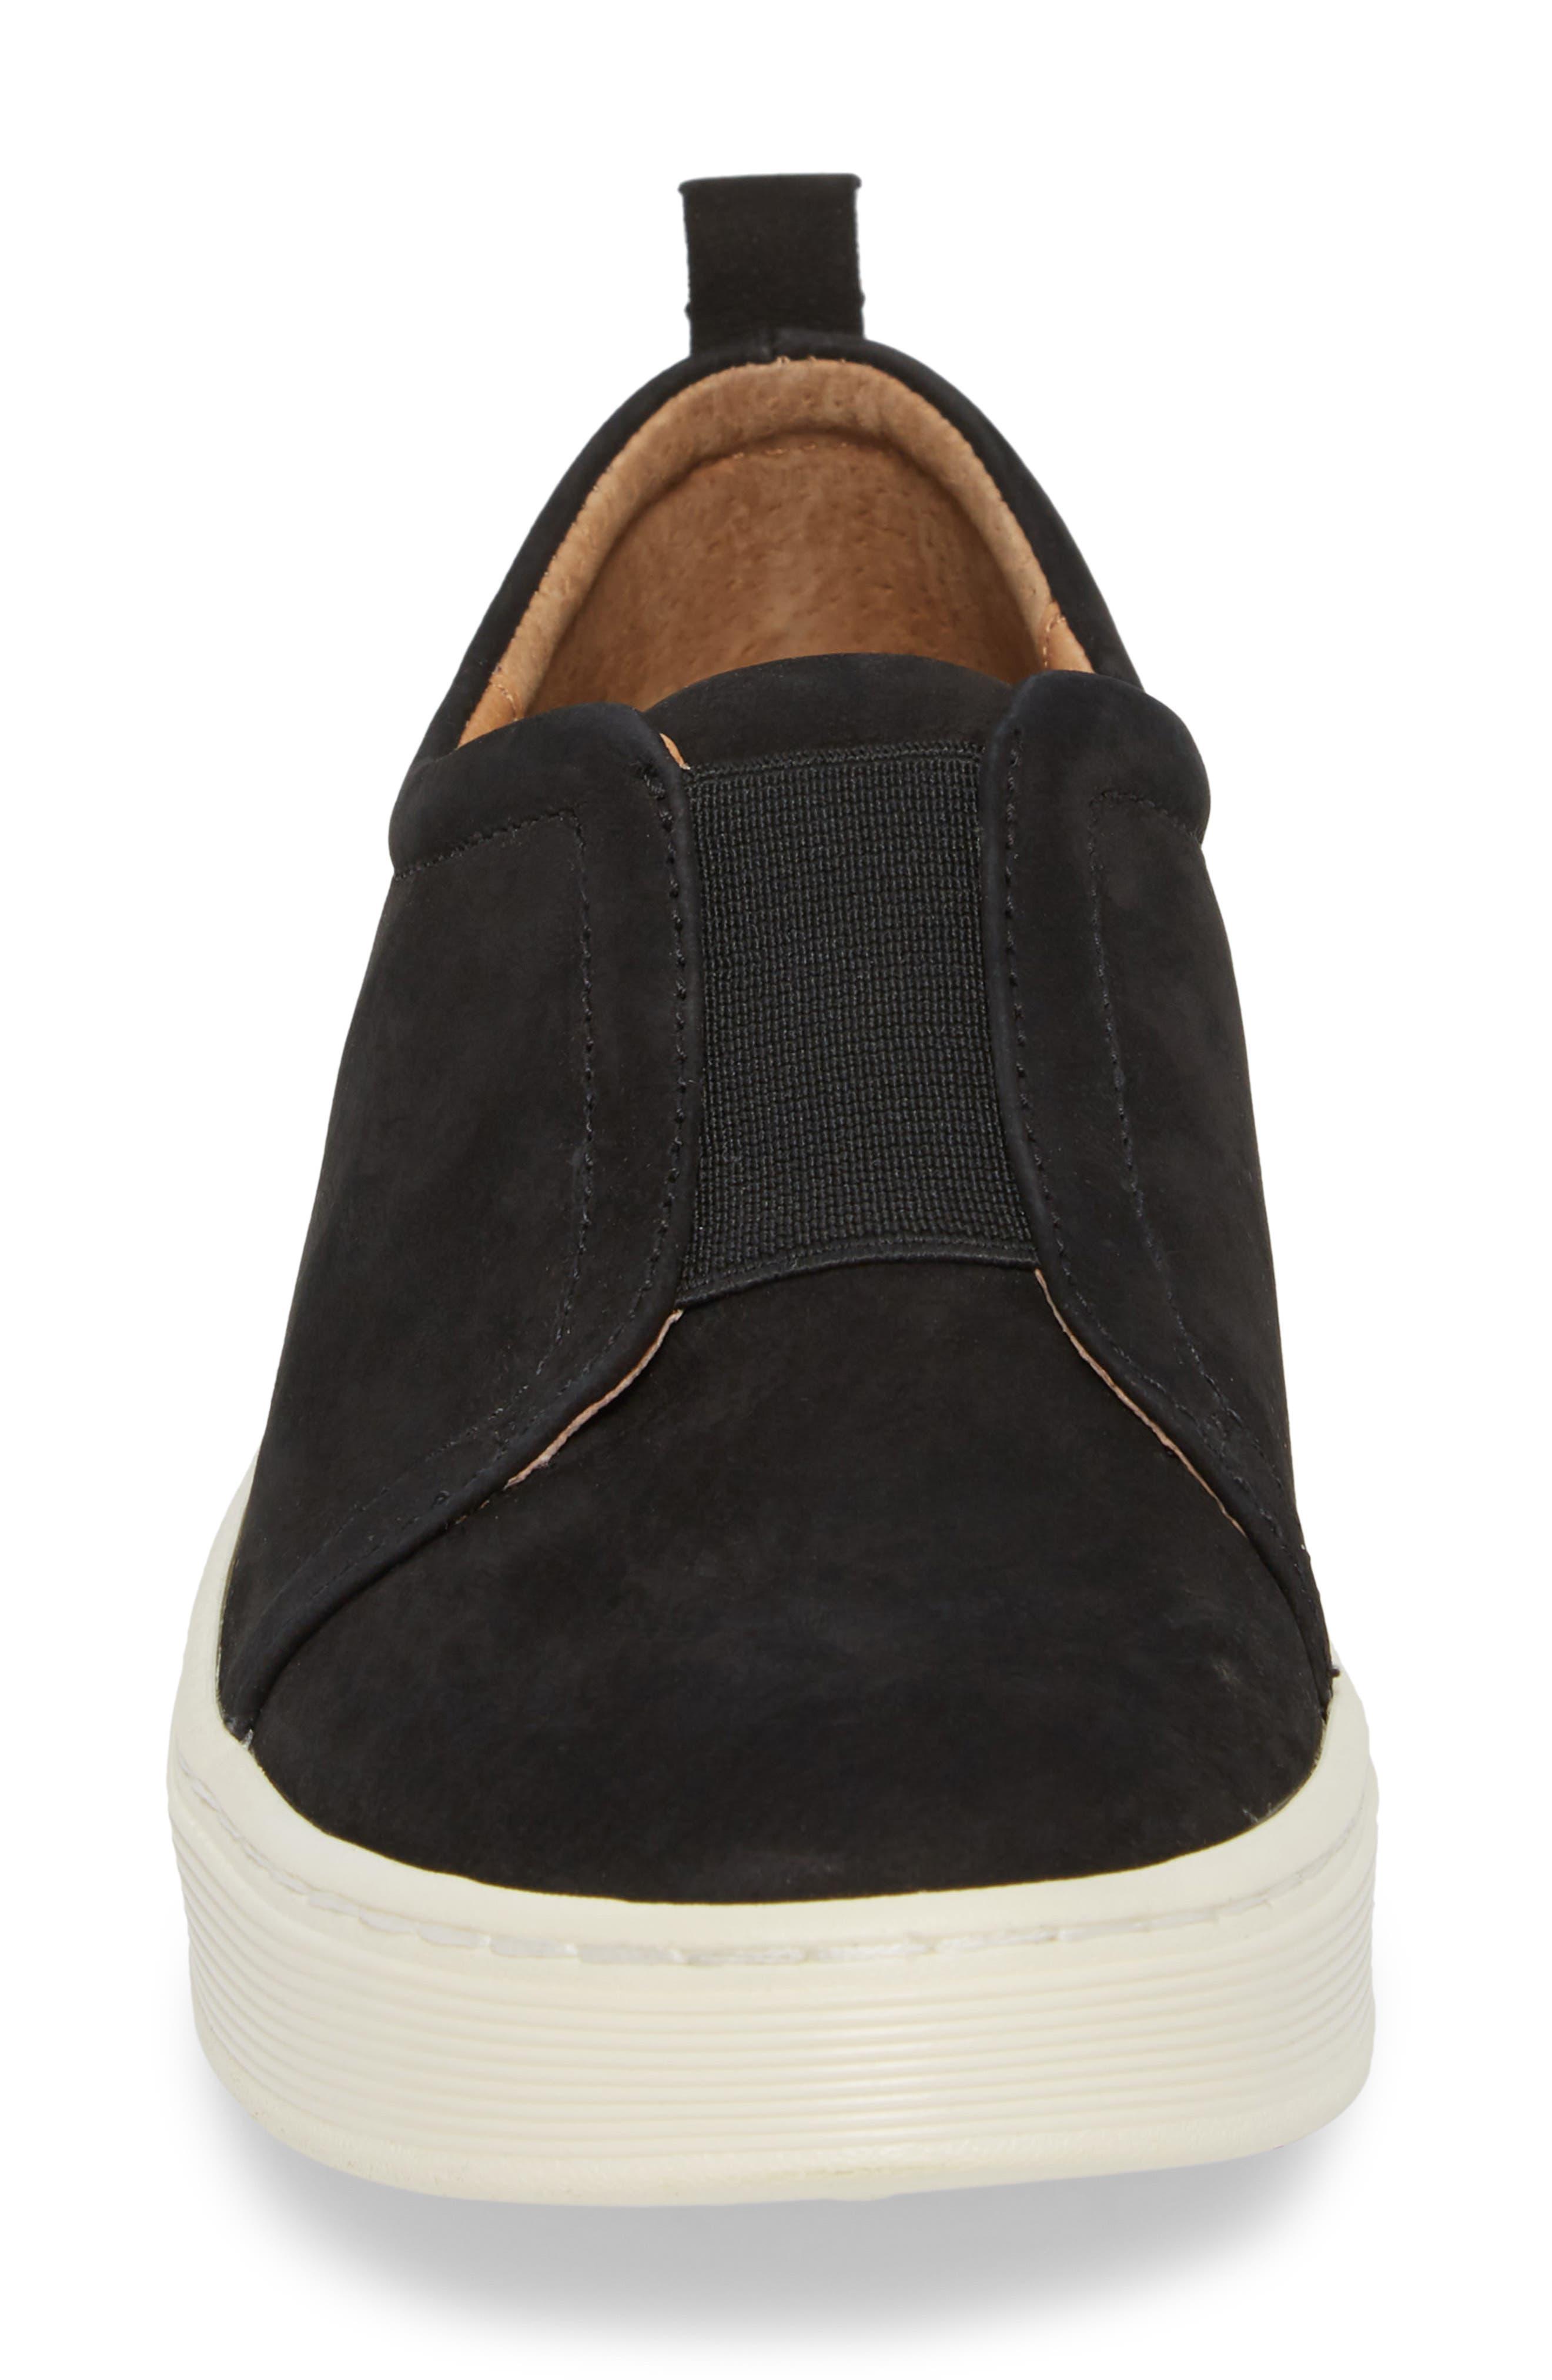 Safia Slip-On Sneaker,                             Alternate thumbnail 4, color,                             TRUE BLACK LEATHER